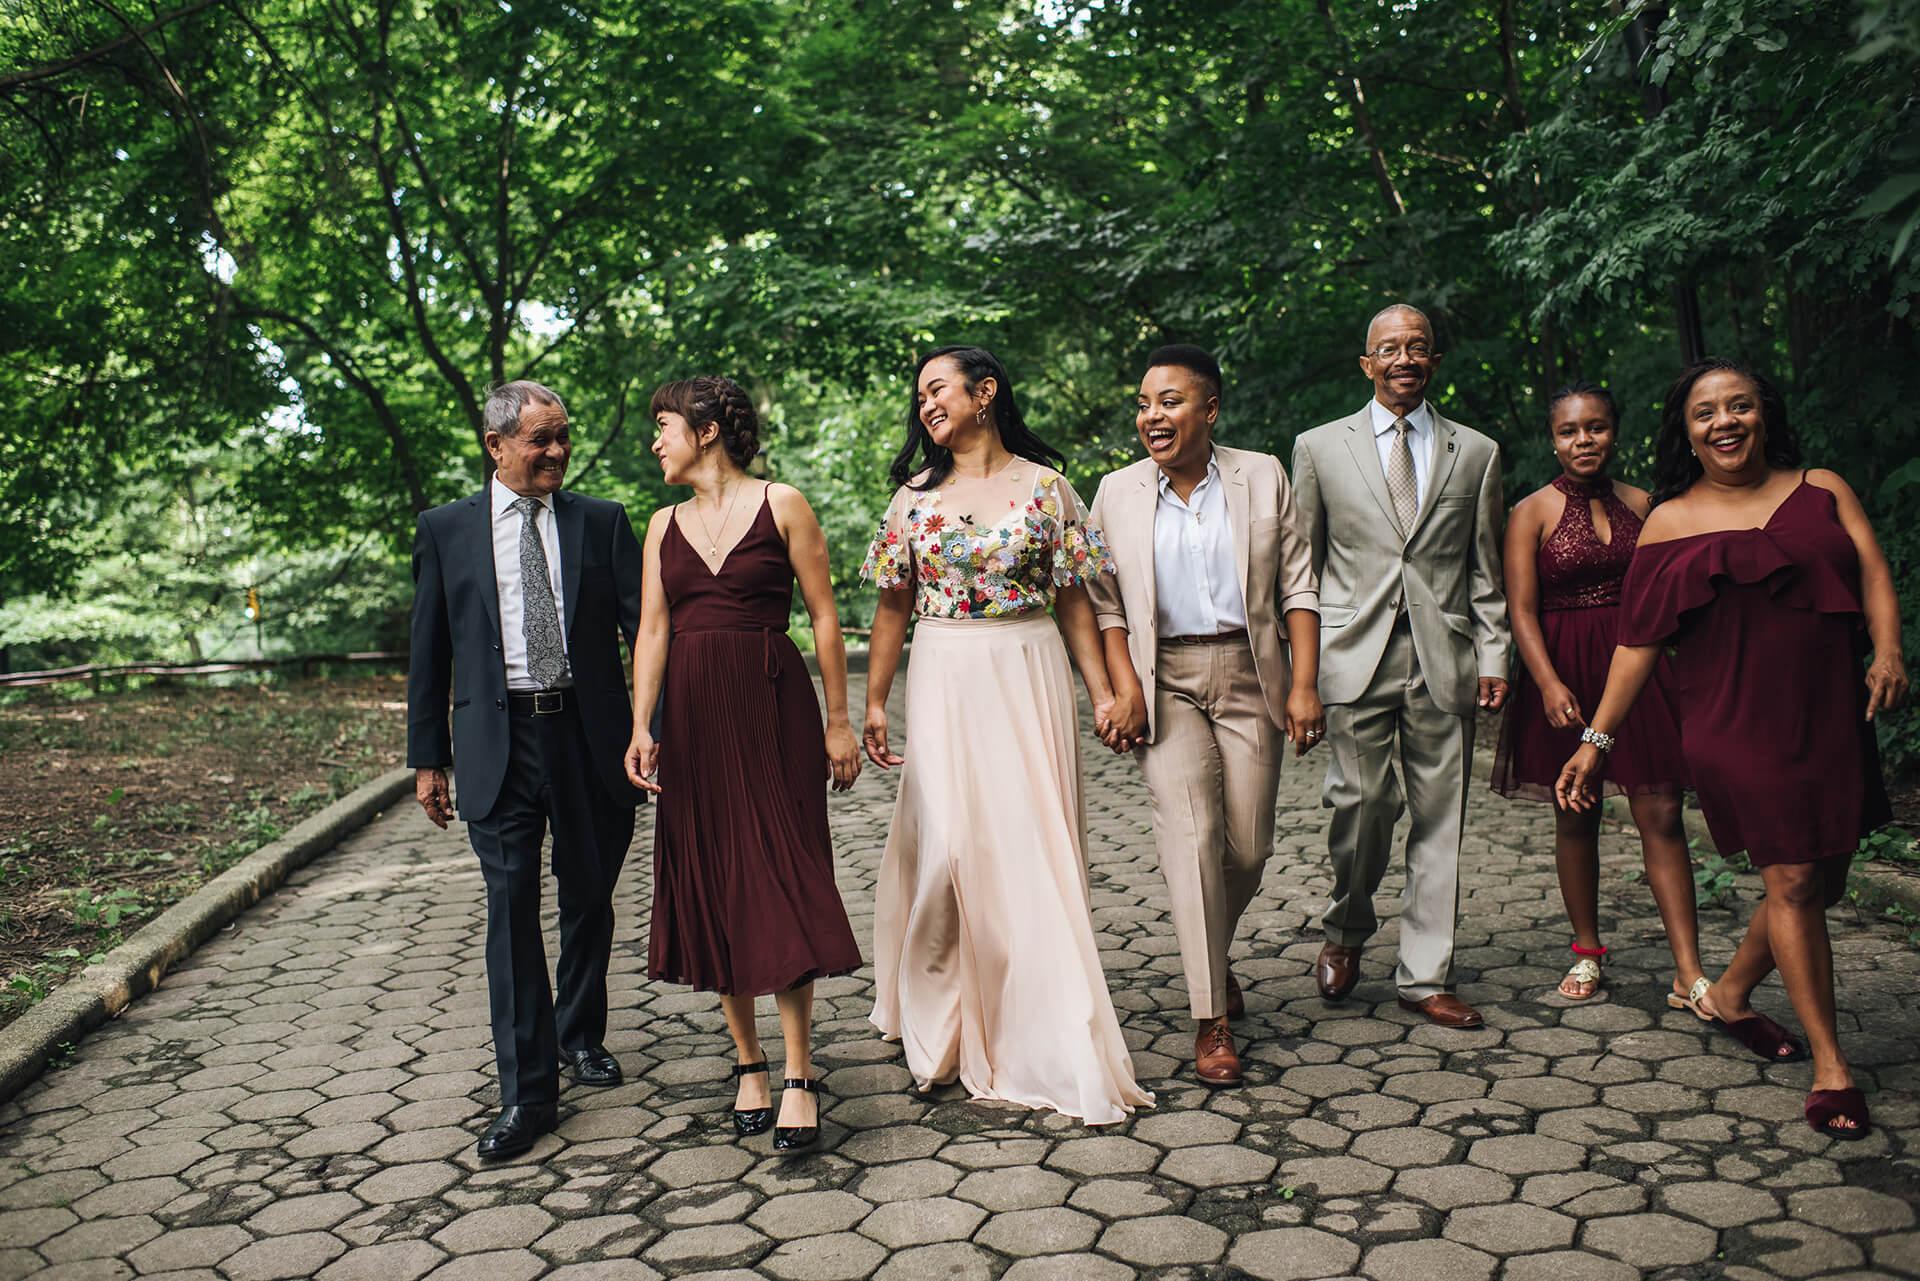 BROOKLYN SOCIETY FOR ETHICAL CULTURE - INTIMATE WEDDING - CHI-CHI ARI-173.jpg